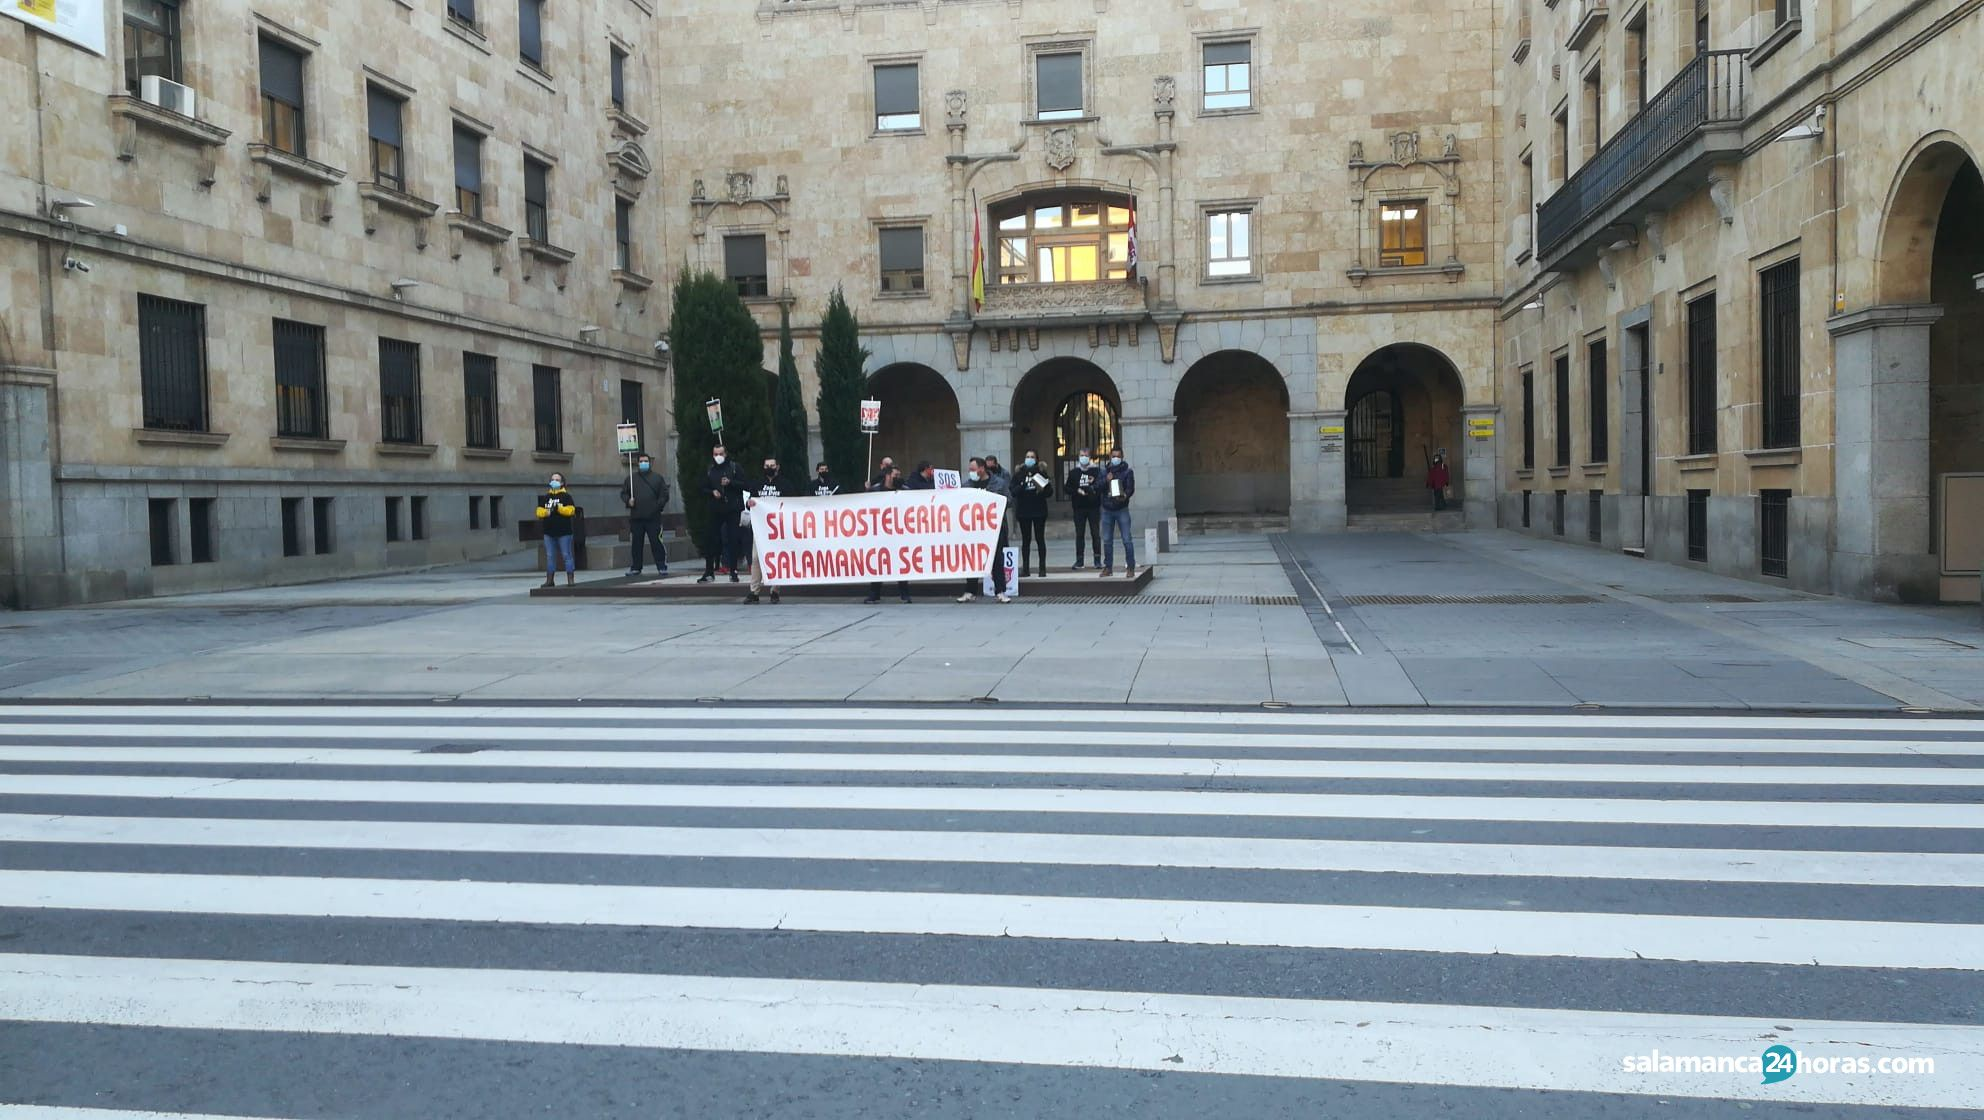 Hosteleros protesta martesWhatsApp Image 2020 12 01 at 09.29.25